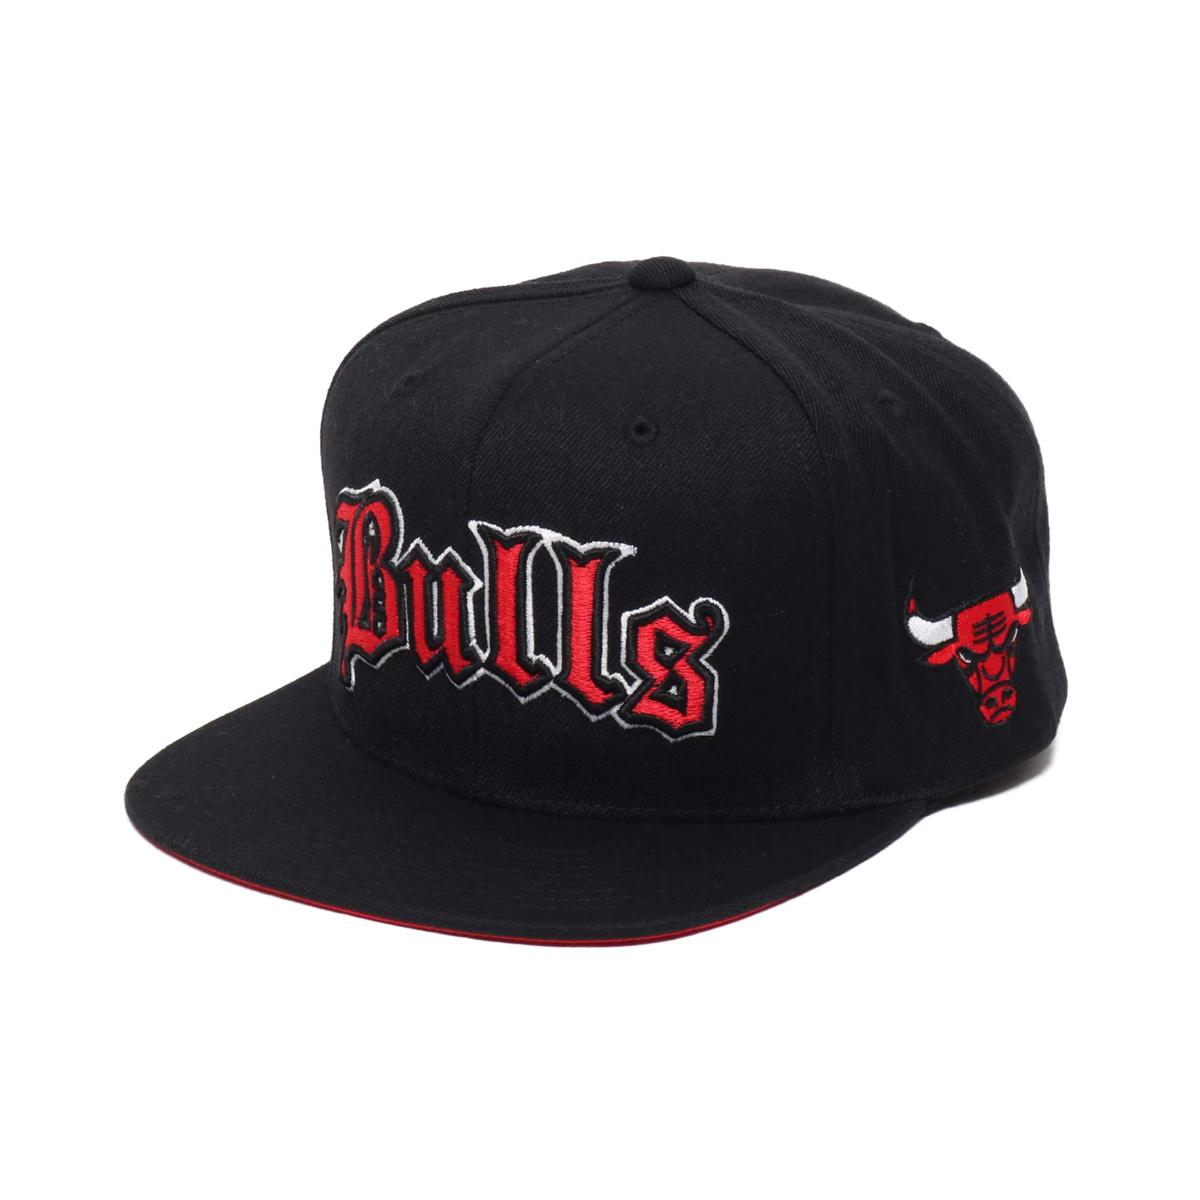 Mitchell & Ness Old English SNAP BACK- CHI.Bulls(ミッチェルアンドネス オールドイングリッシュ キャップ/シカゴブルズ)BLACK【メンズ キャップ】19HO-I